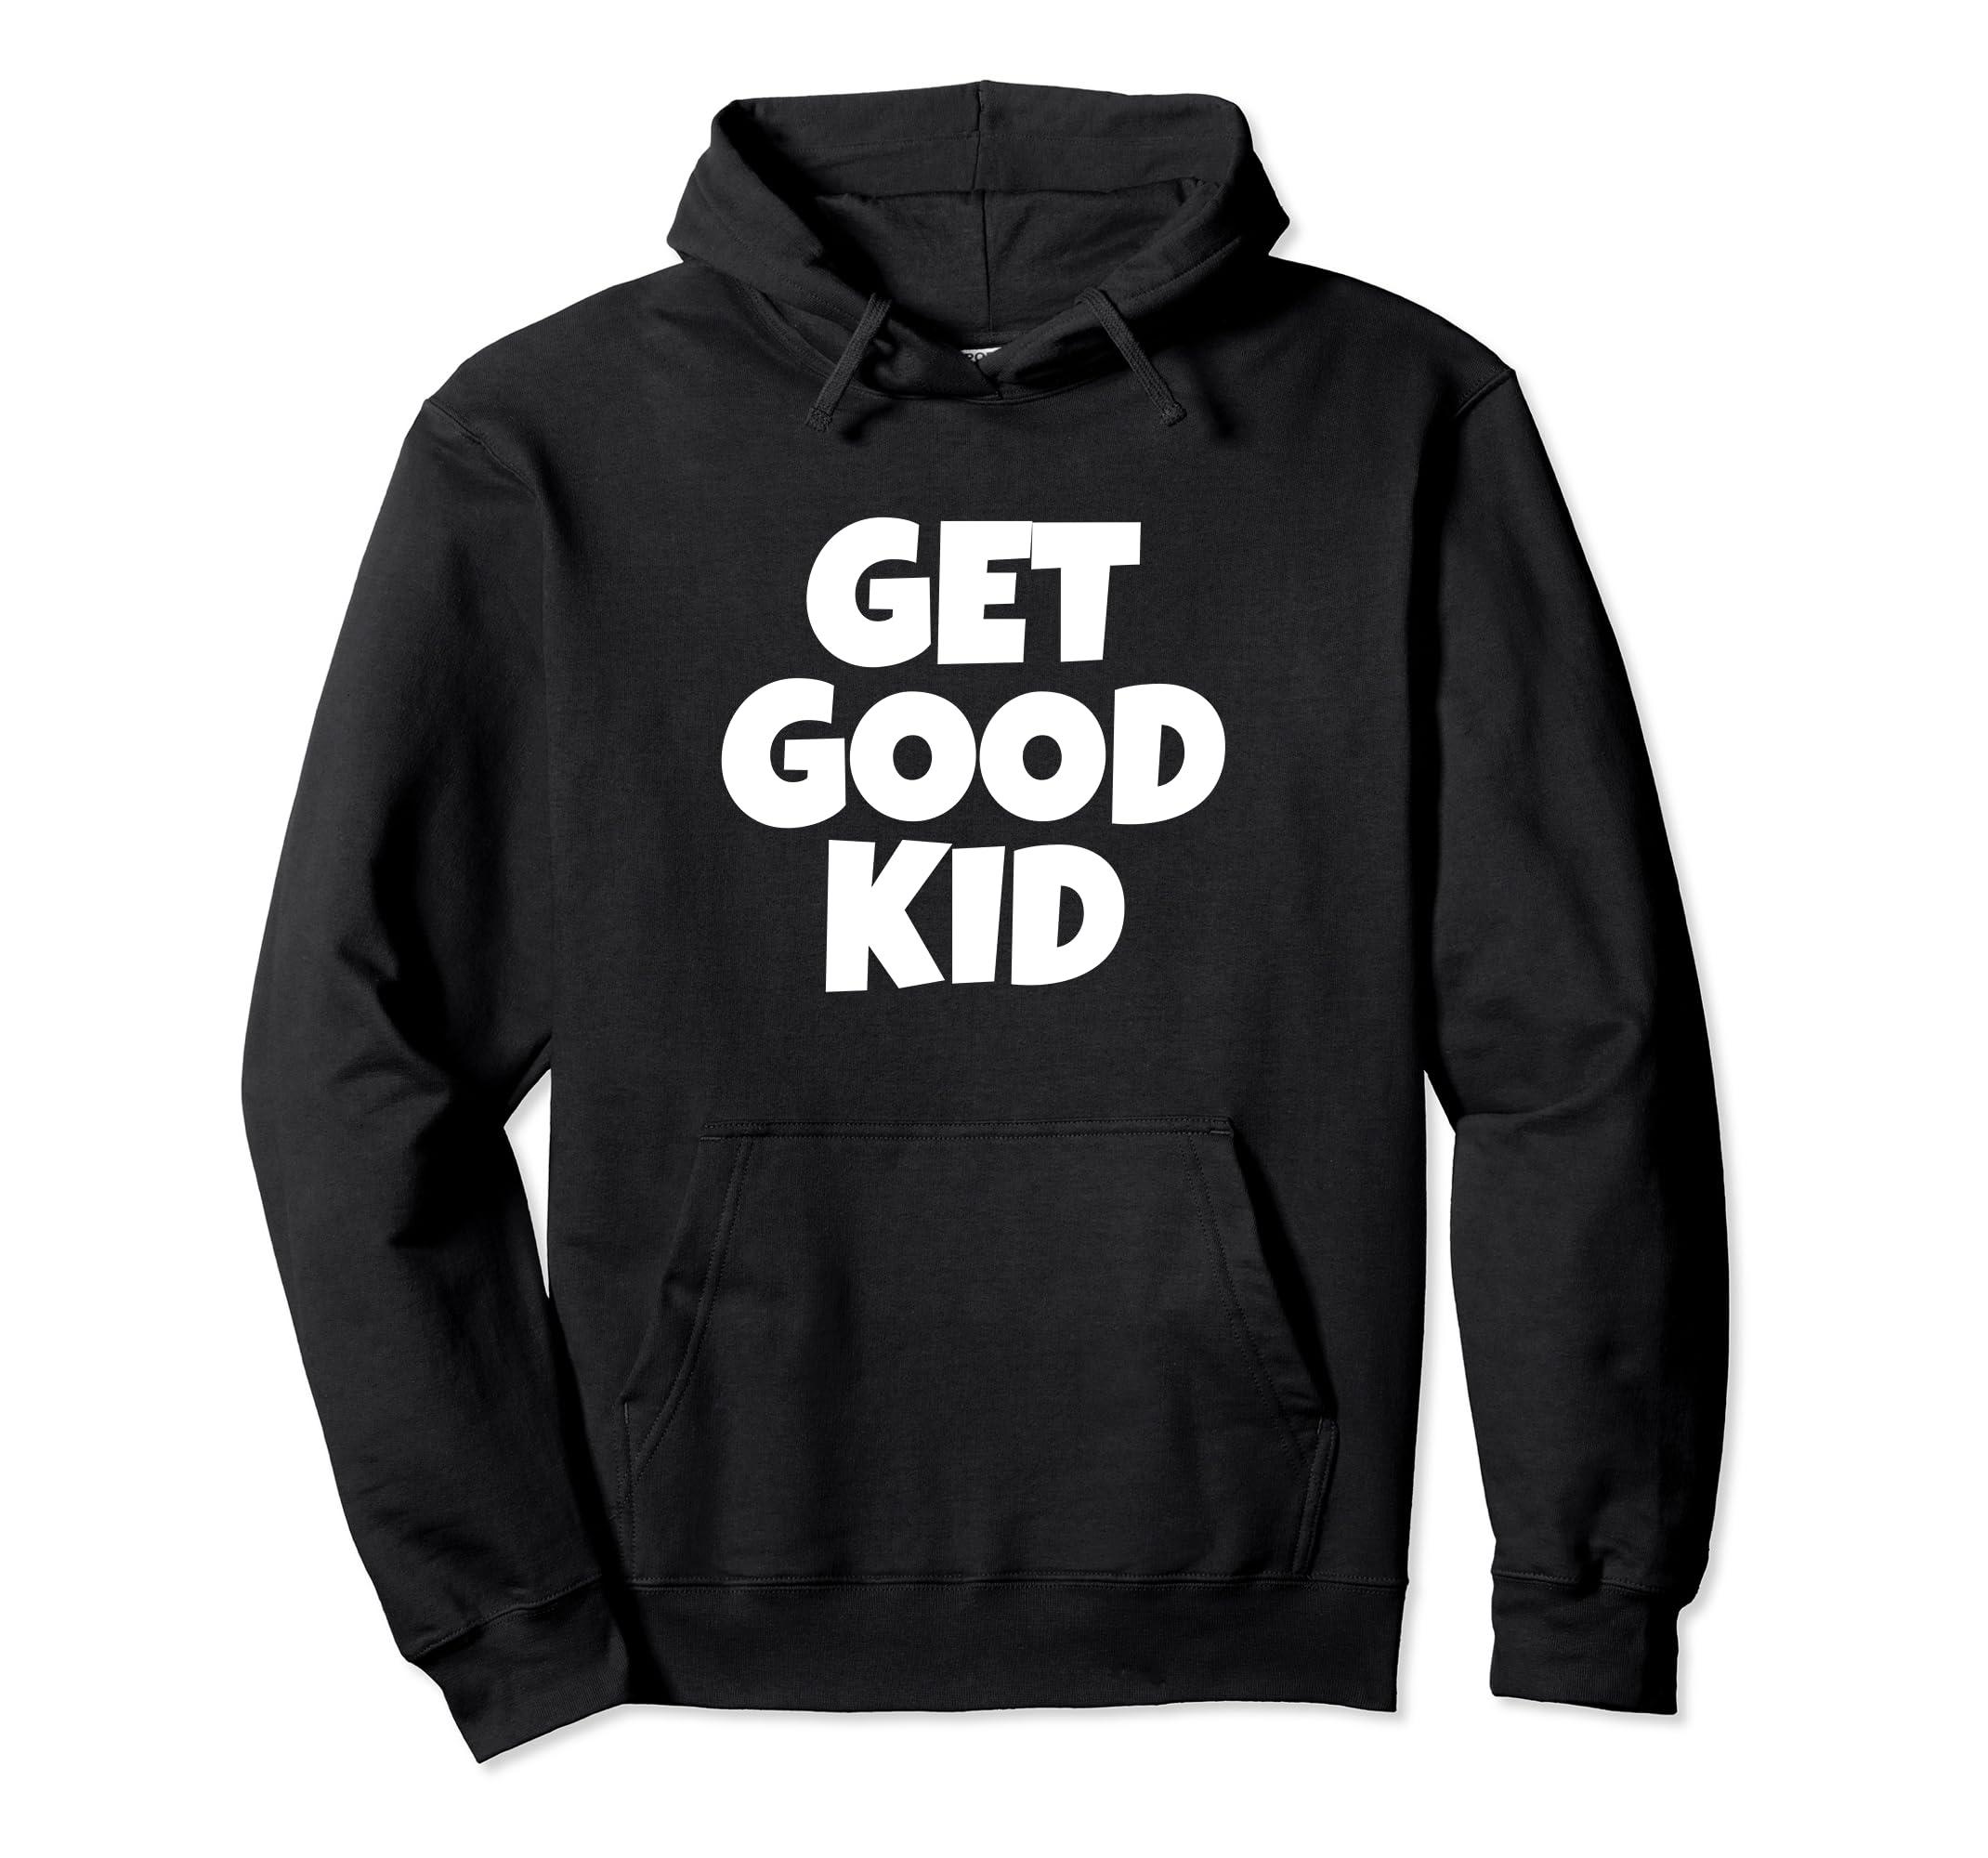 Amazon.com: Get Good Kid   Ninja Video Gamer Hoodie: Clothing